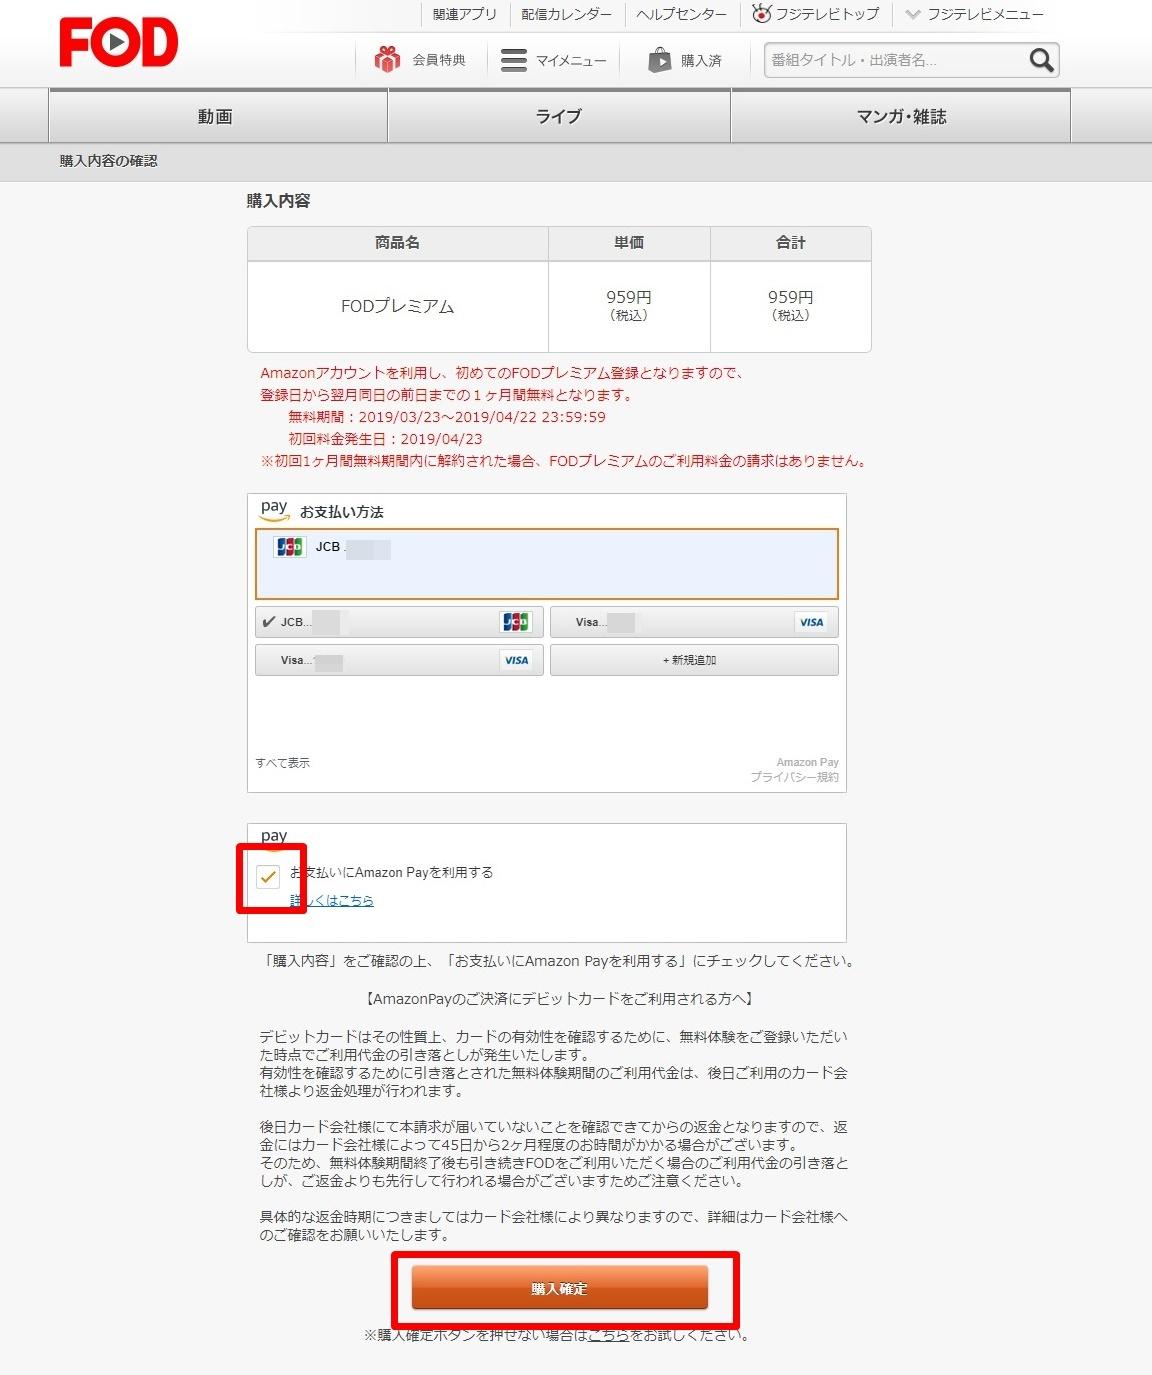 FOD登録手順7